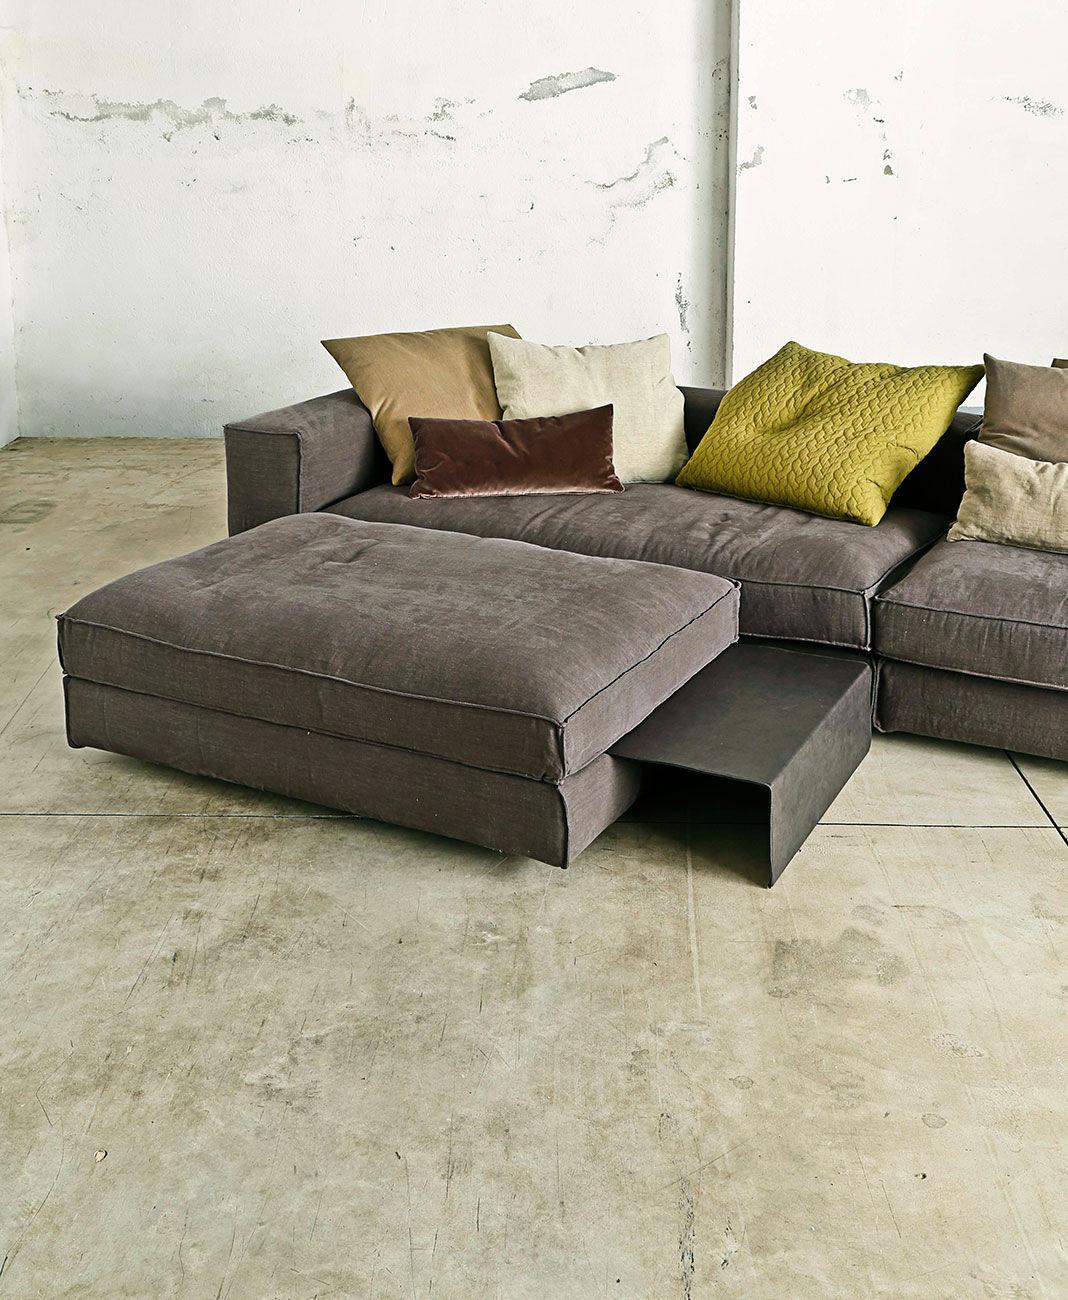 Sofa modern braun  Modulierbares Sofa / modern / Stoffbezug / braun - SHABBY - art ...